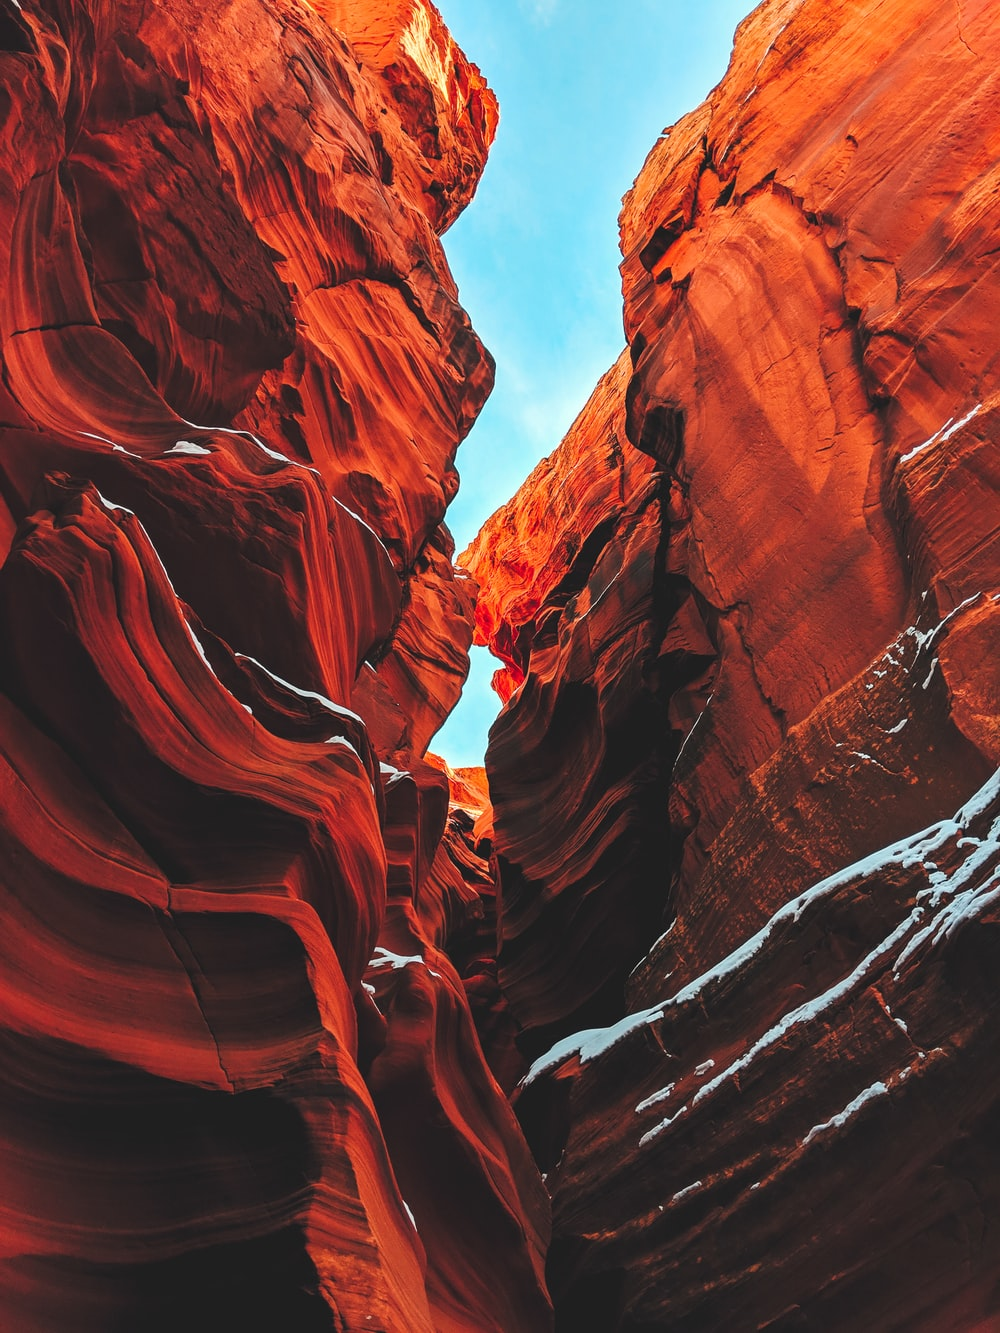 Arizona Grand Canyon under blue sky during daytime